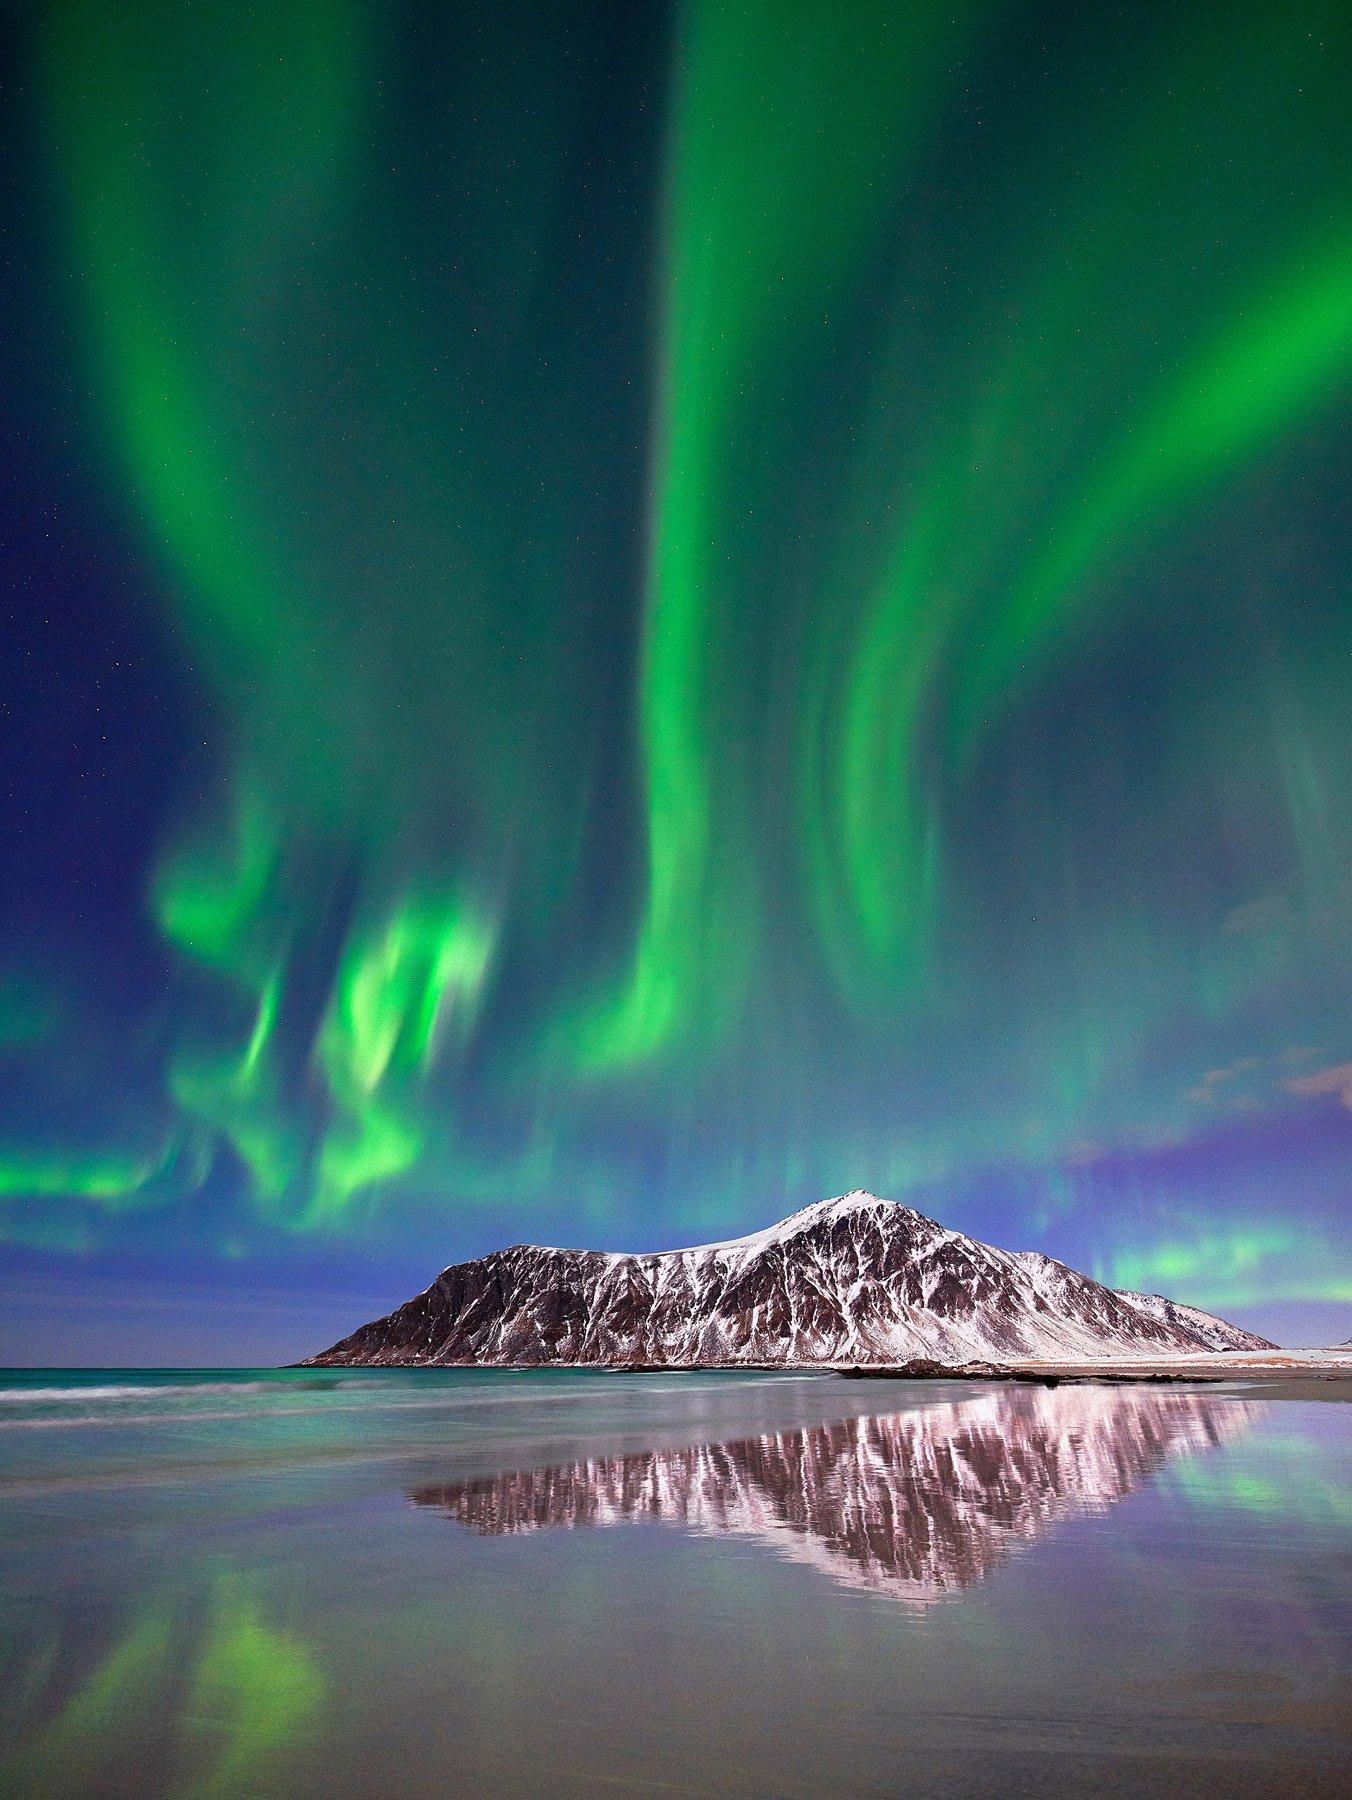 Aurora Borealis in Lofoten, Norway.